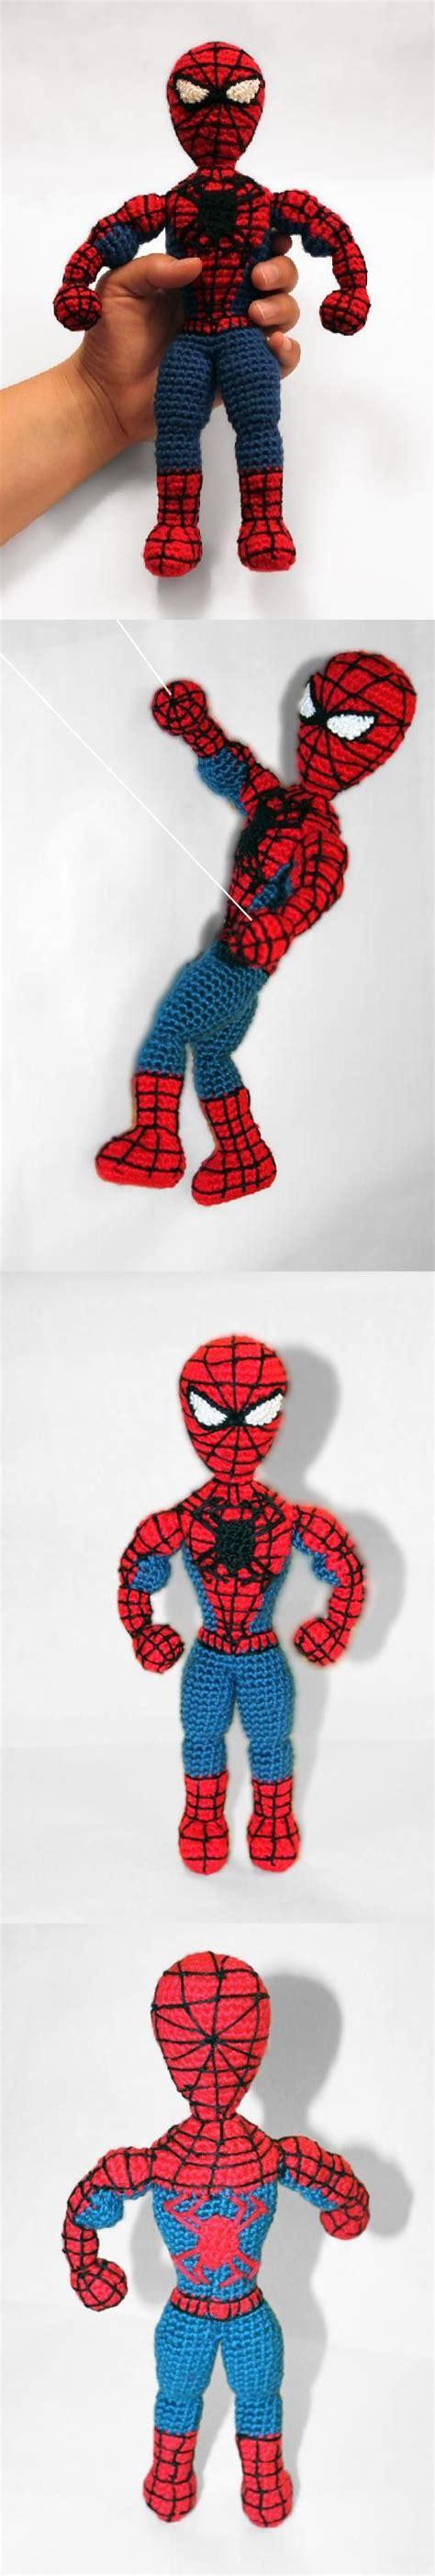 spiderman doll pattern spiderman superhero amigurumi pattern by sahrit shops